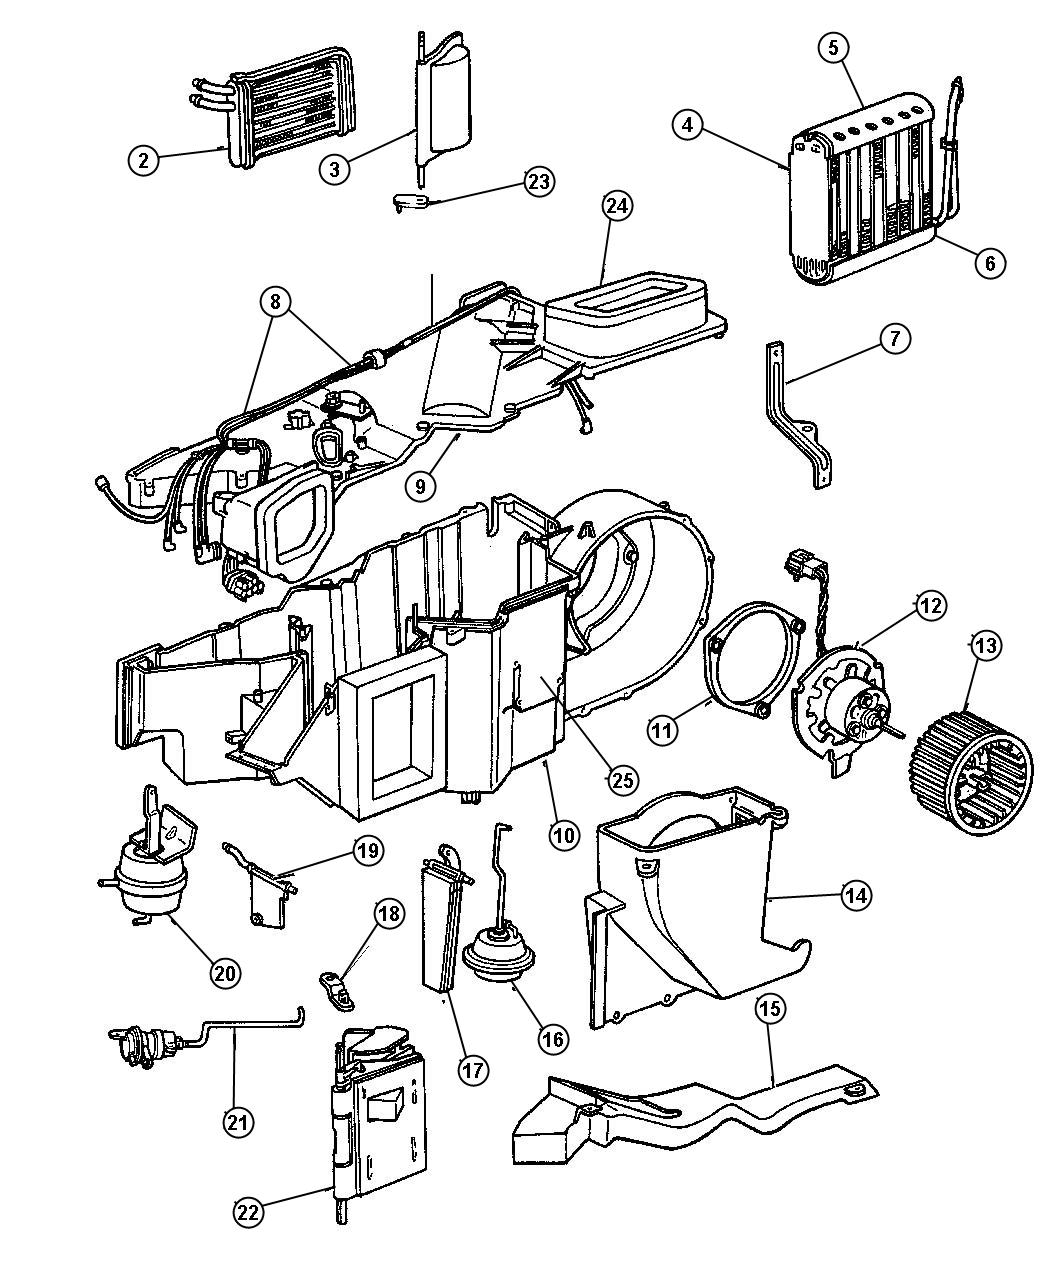 1992 Dodge Motor. Blower with wheel. Blower, htr. Blower